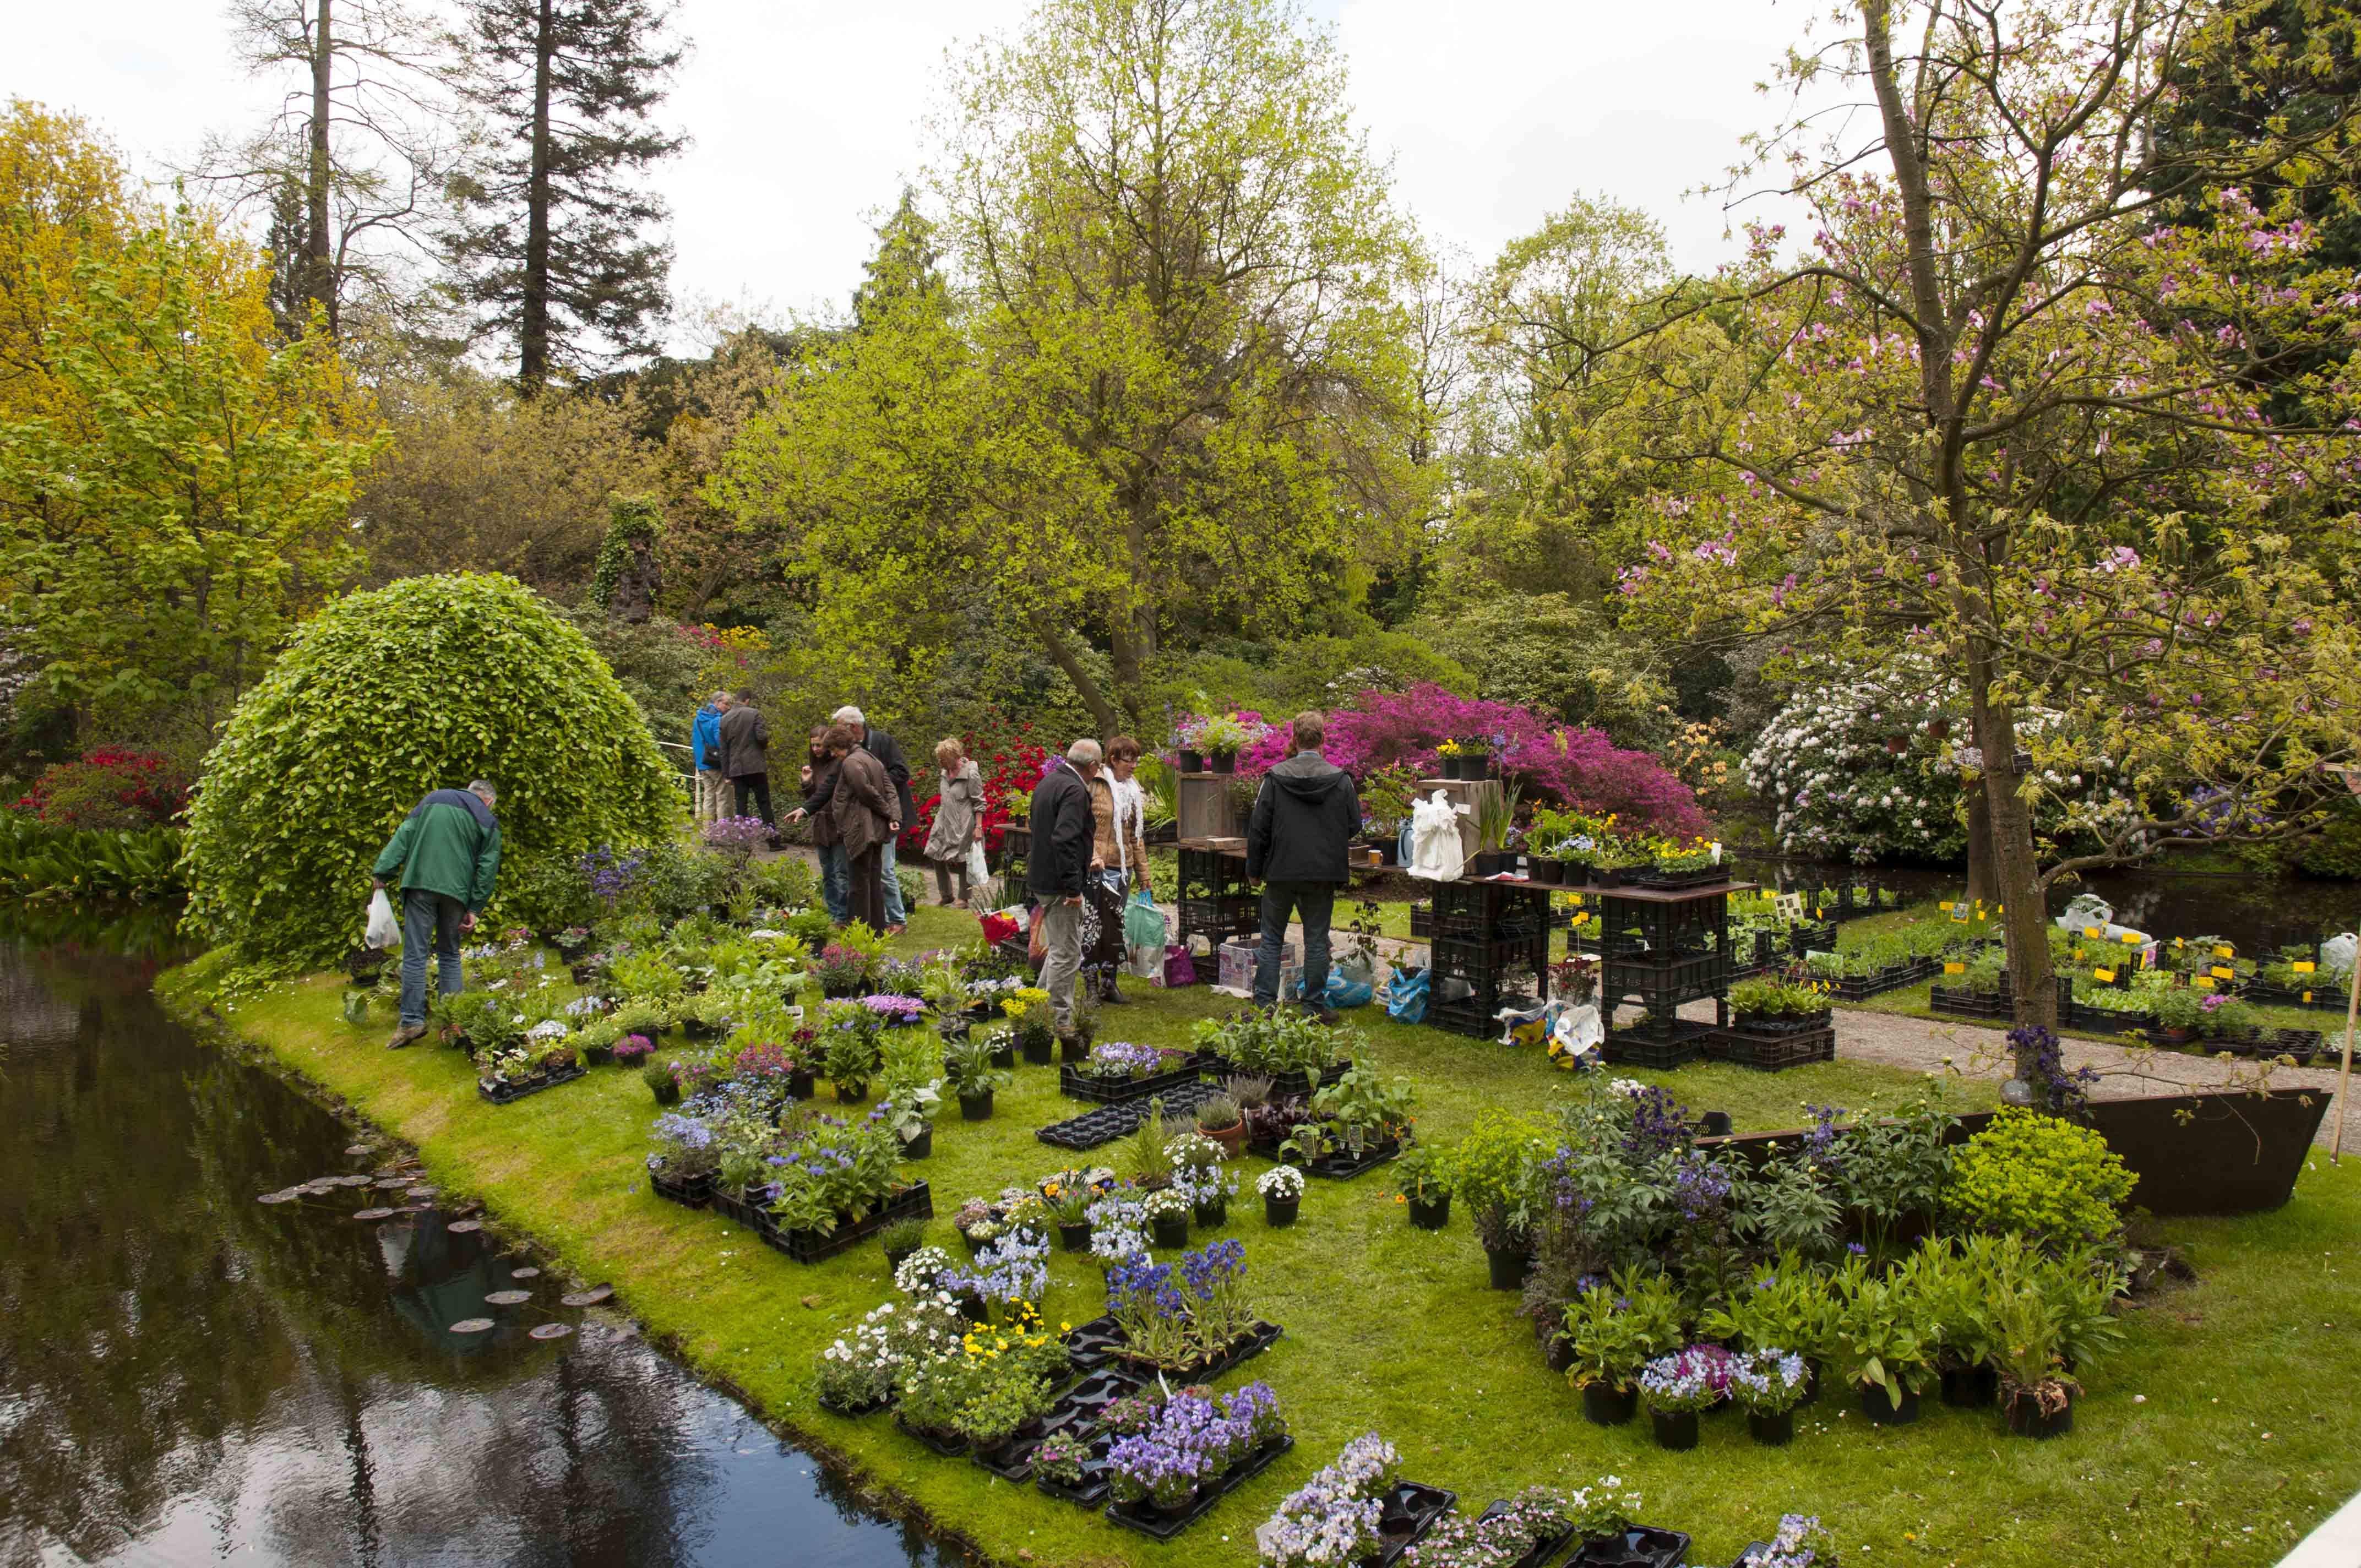 Trompenburg tuinen arboretum kralingen crooswijk for De tuinen rotterdam